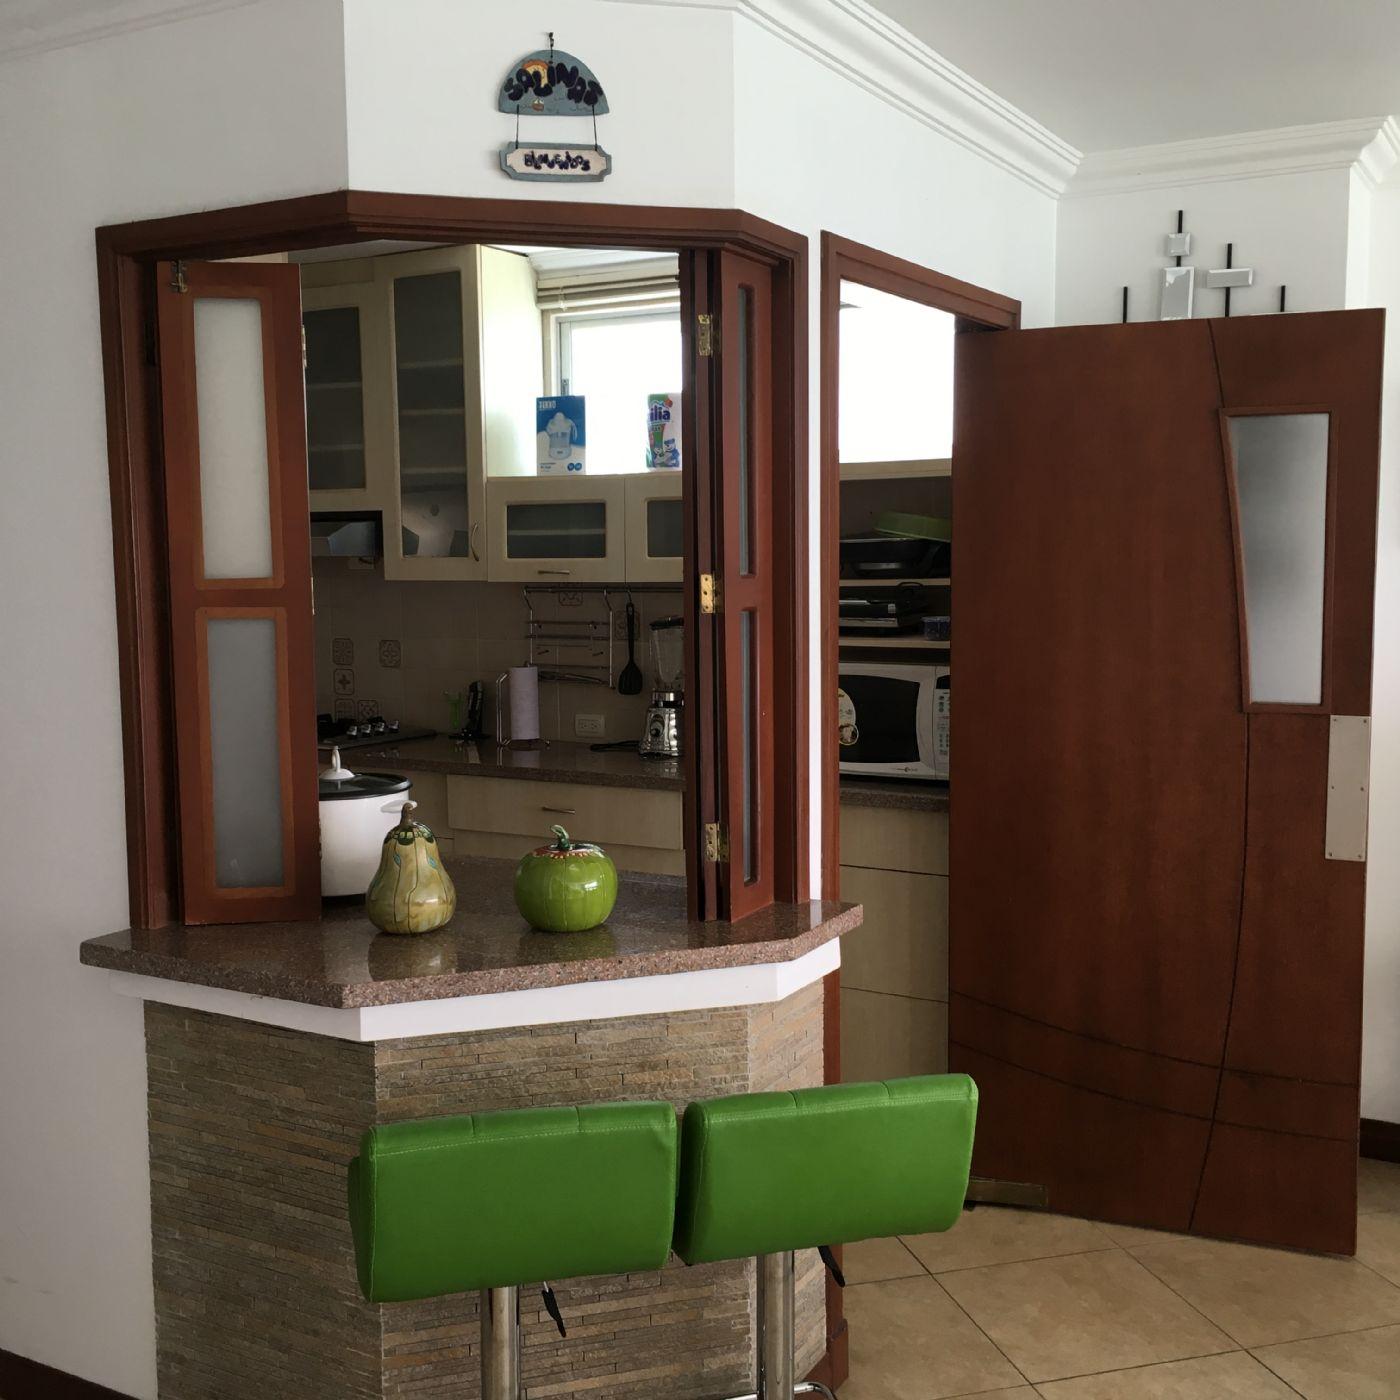 Salinas-Ecuador-property-496908-10.JPG